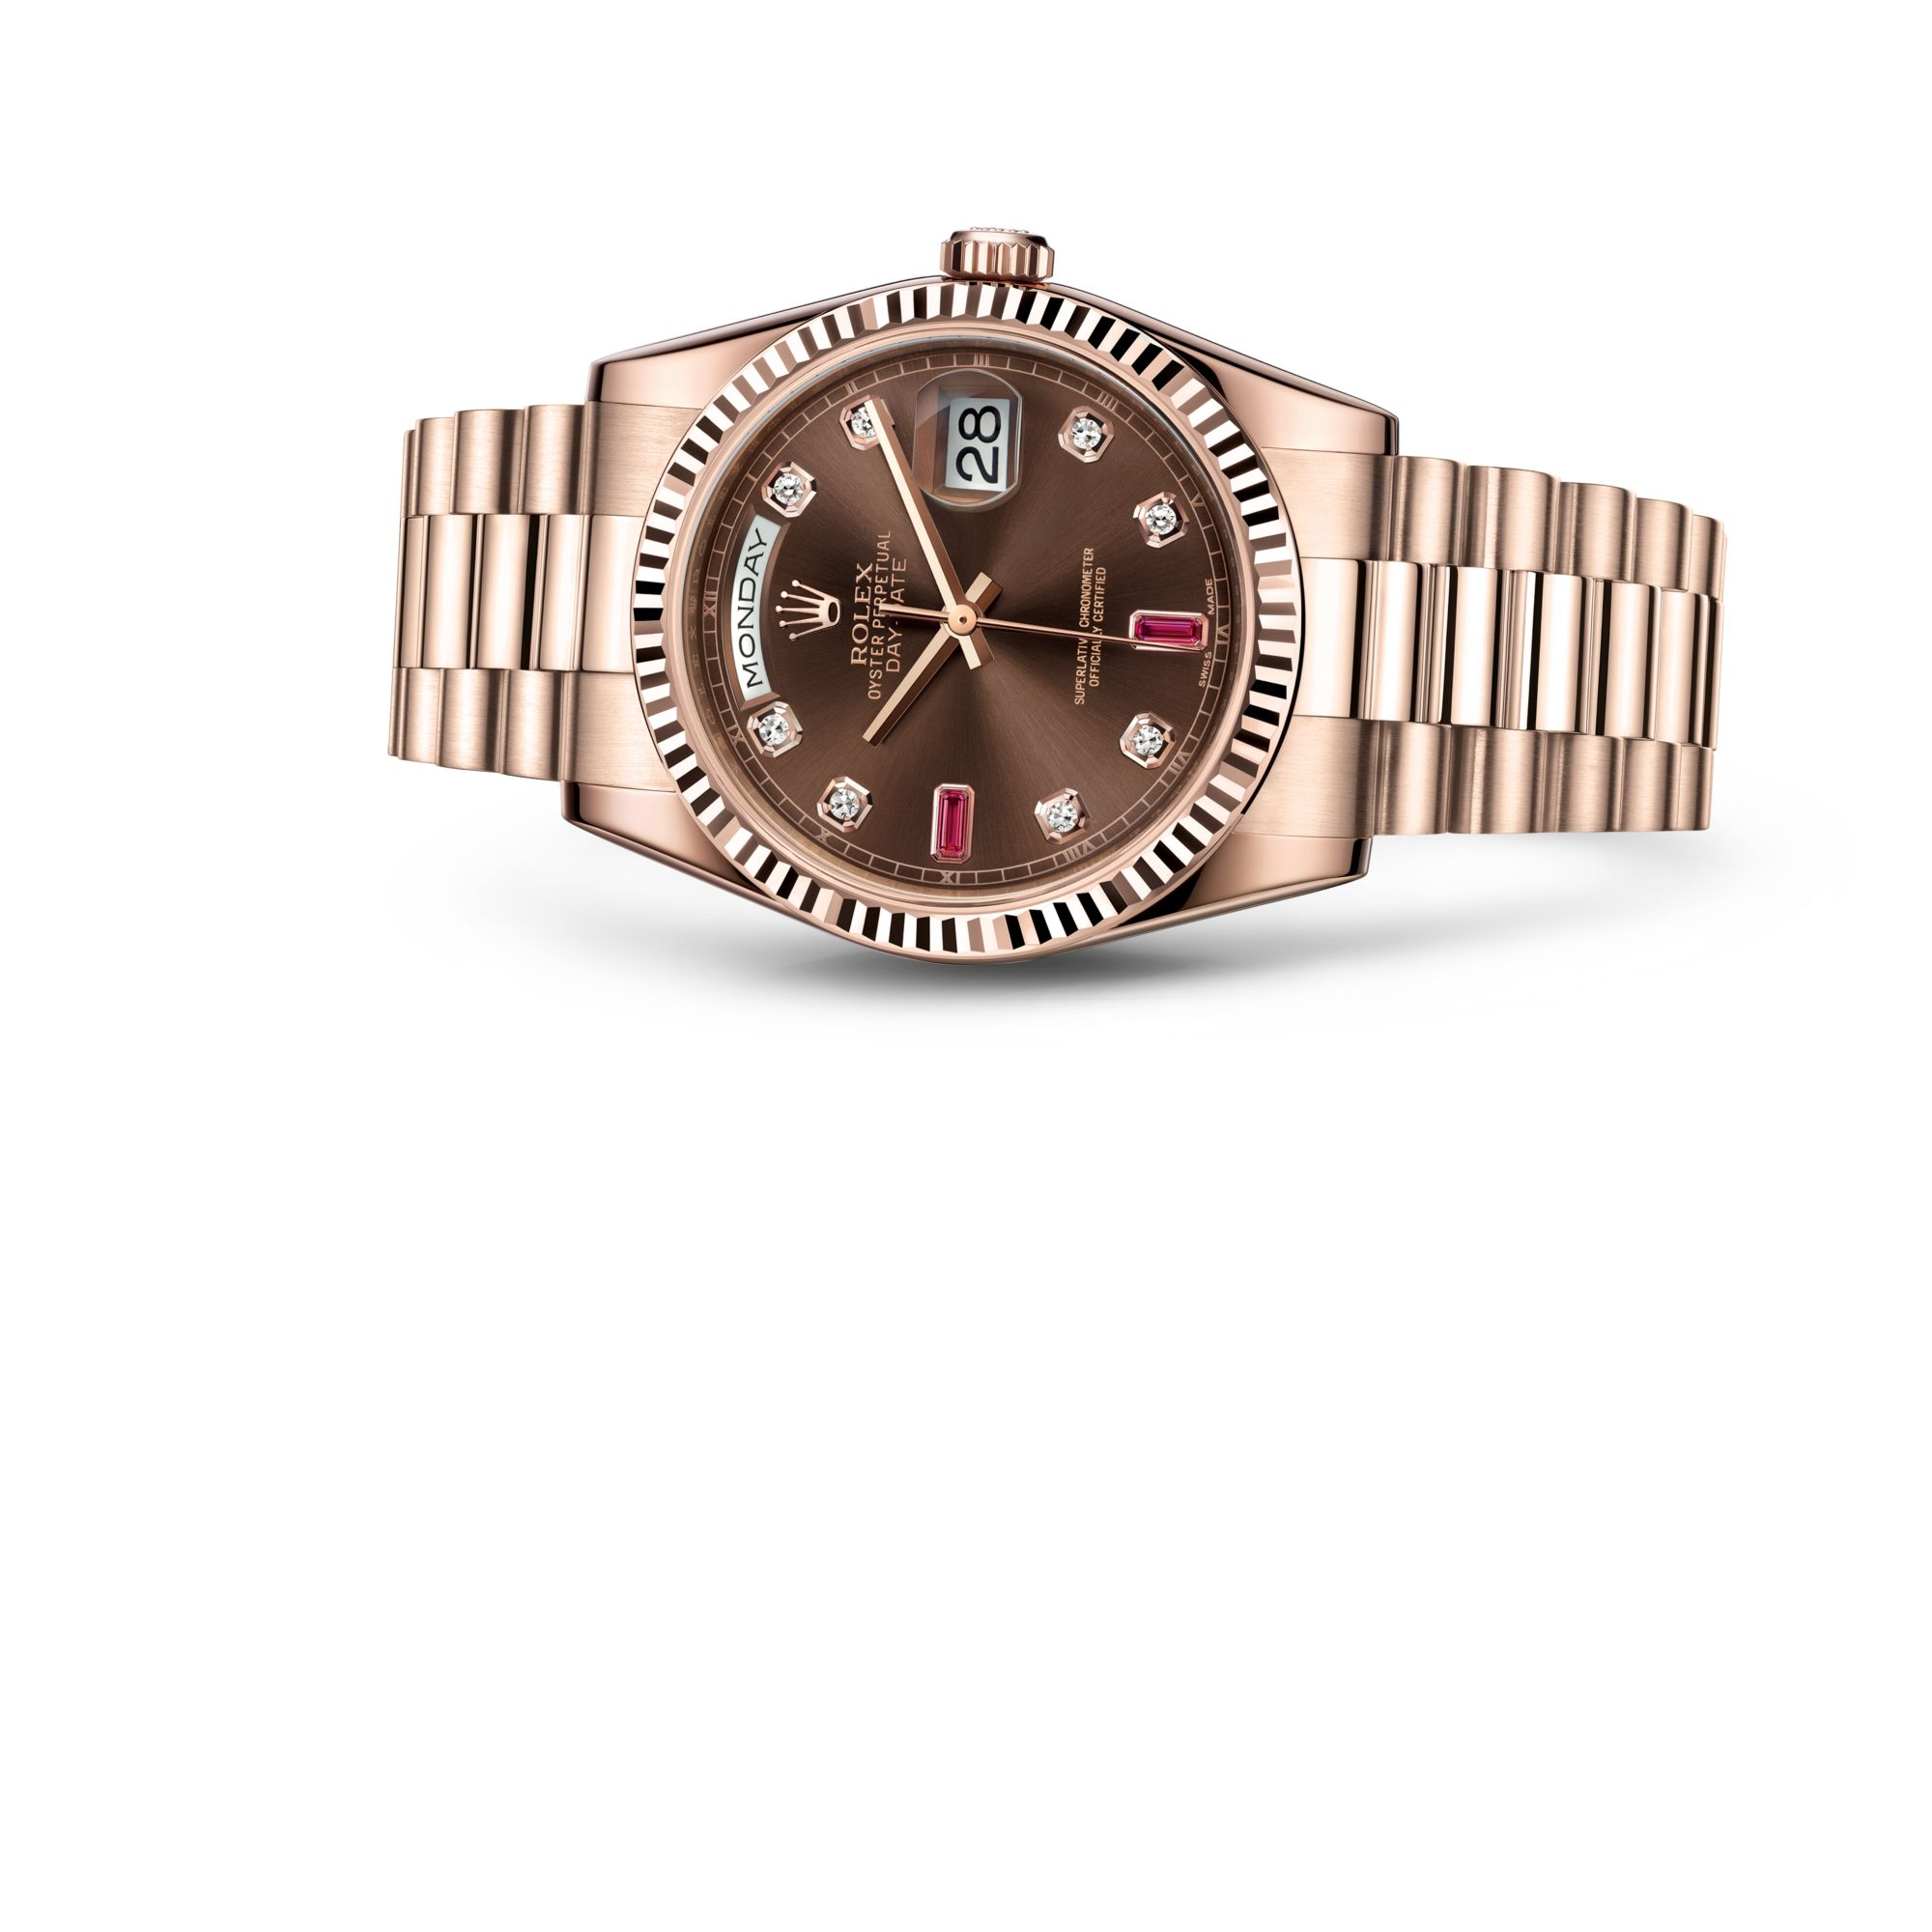 Rolex داي ديت ۳٦ M118235F-0093